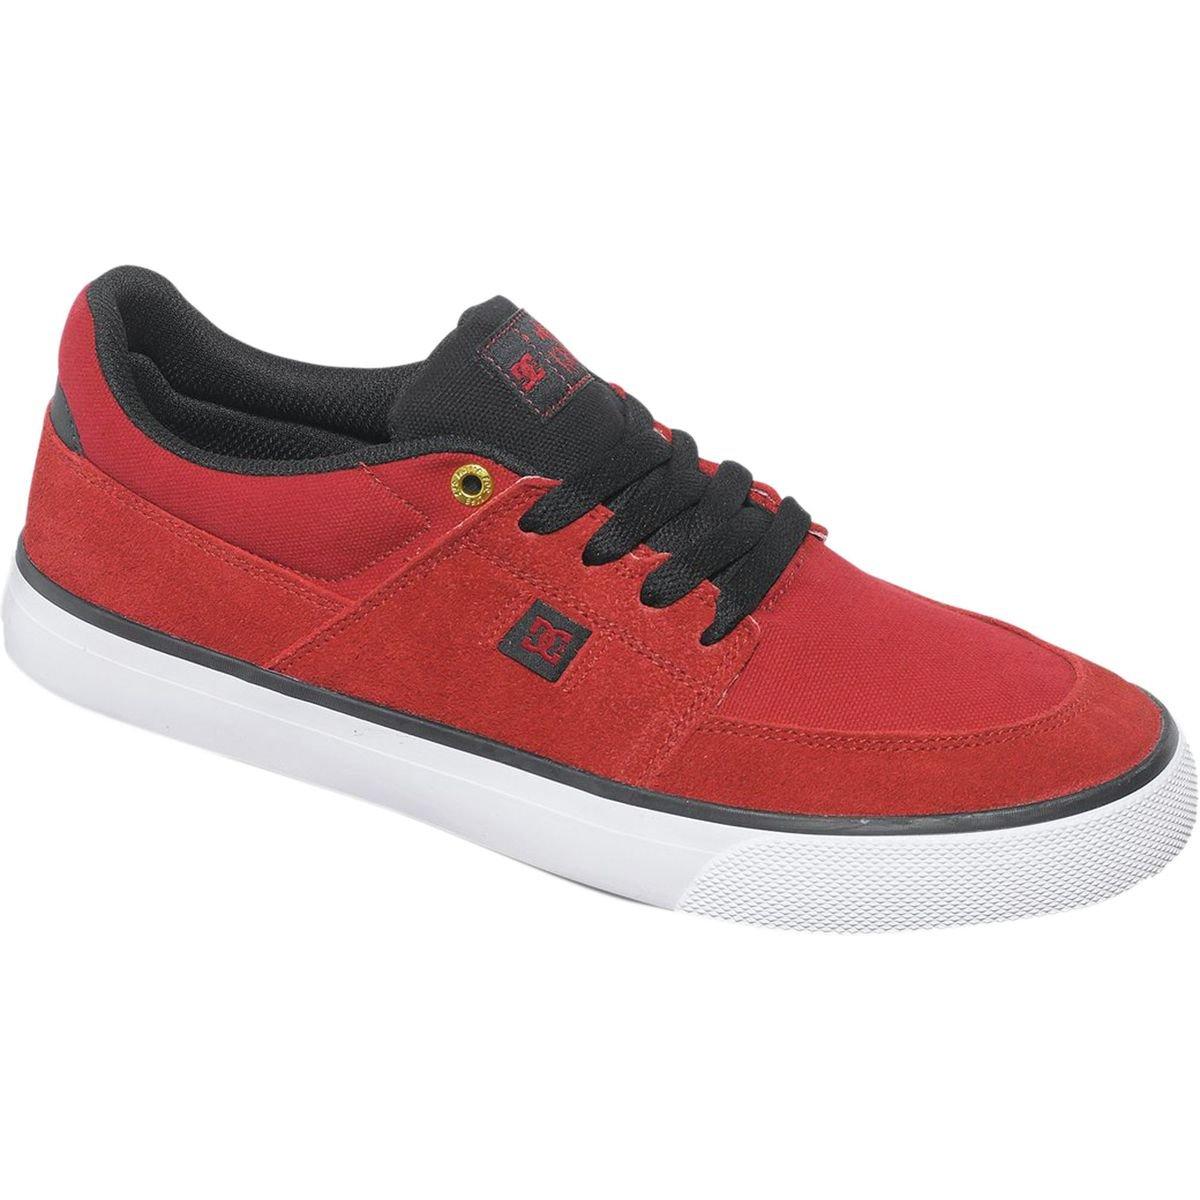 DC - Junge Männer Wes Kremer S Low Low Low Top Schuhe, EUR  45, rot schwarz a95cc7